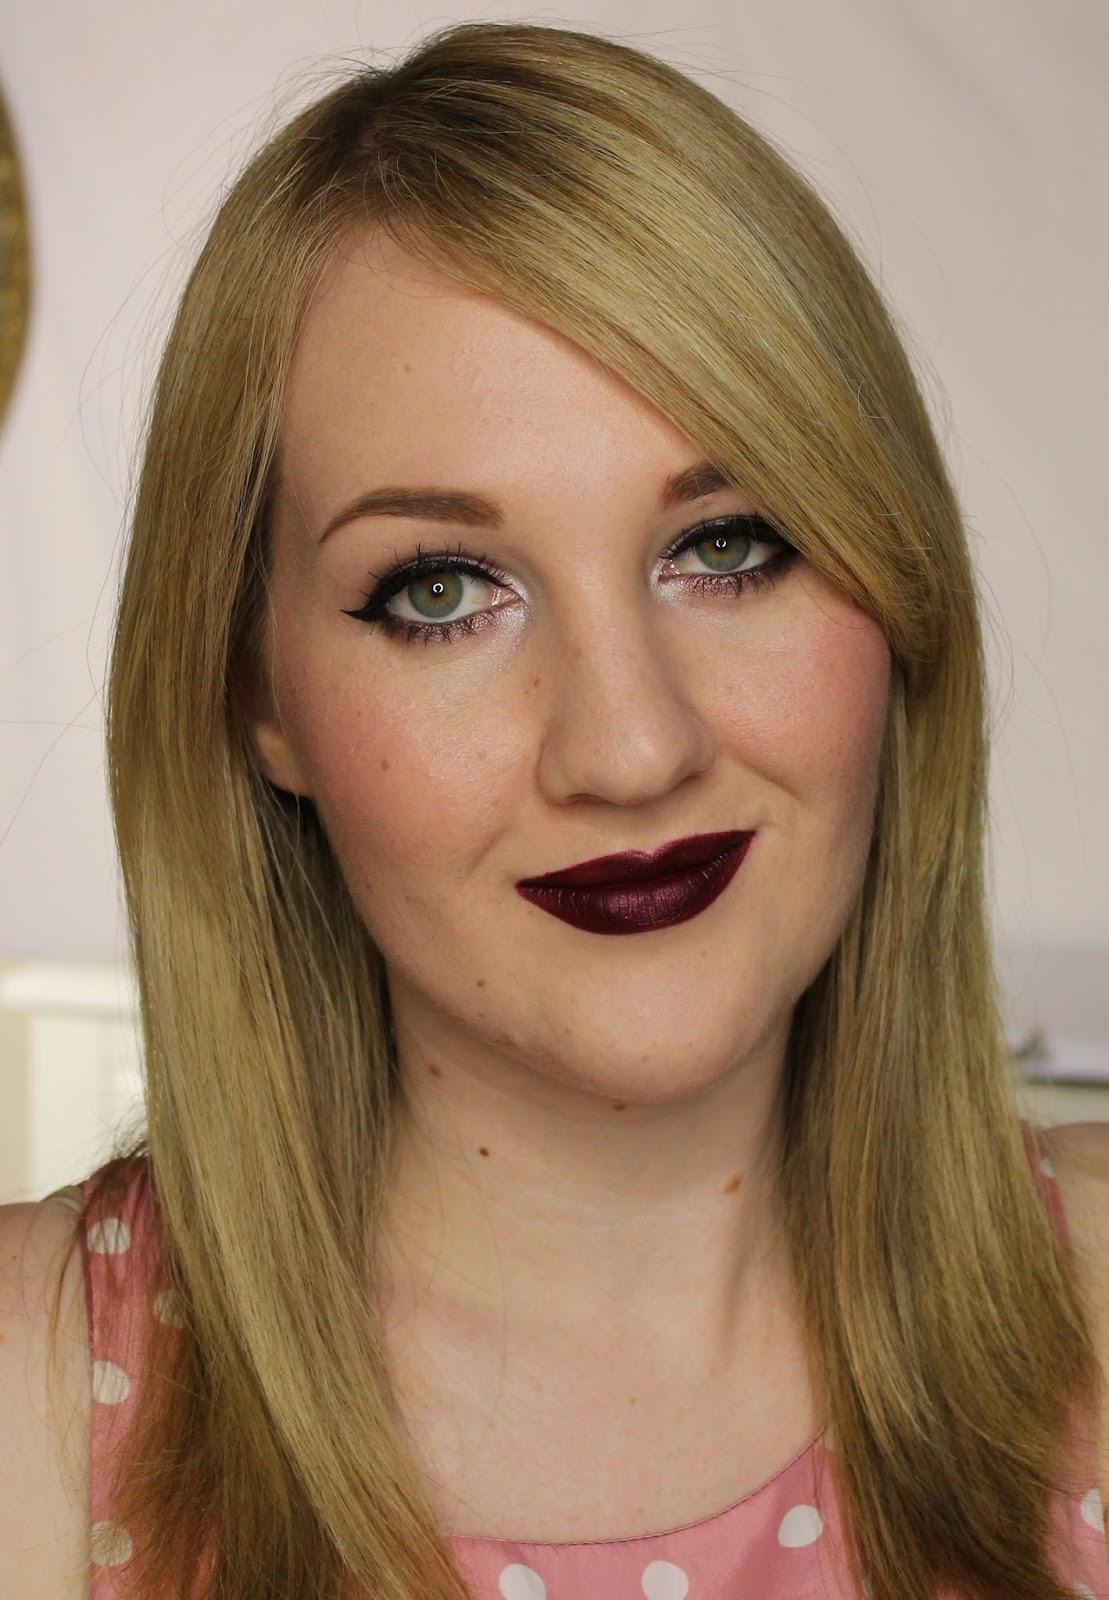 Anastasia Beverly Hills: Anastasia Beverly Hills Liquid Lipstick